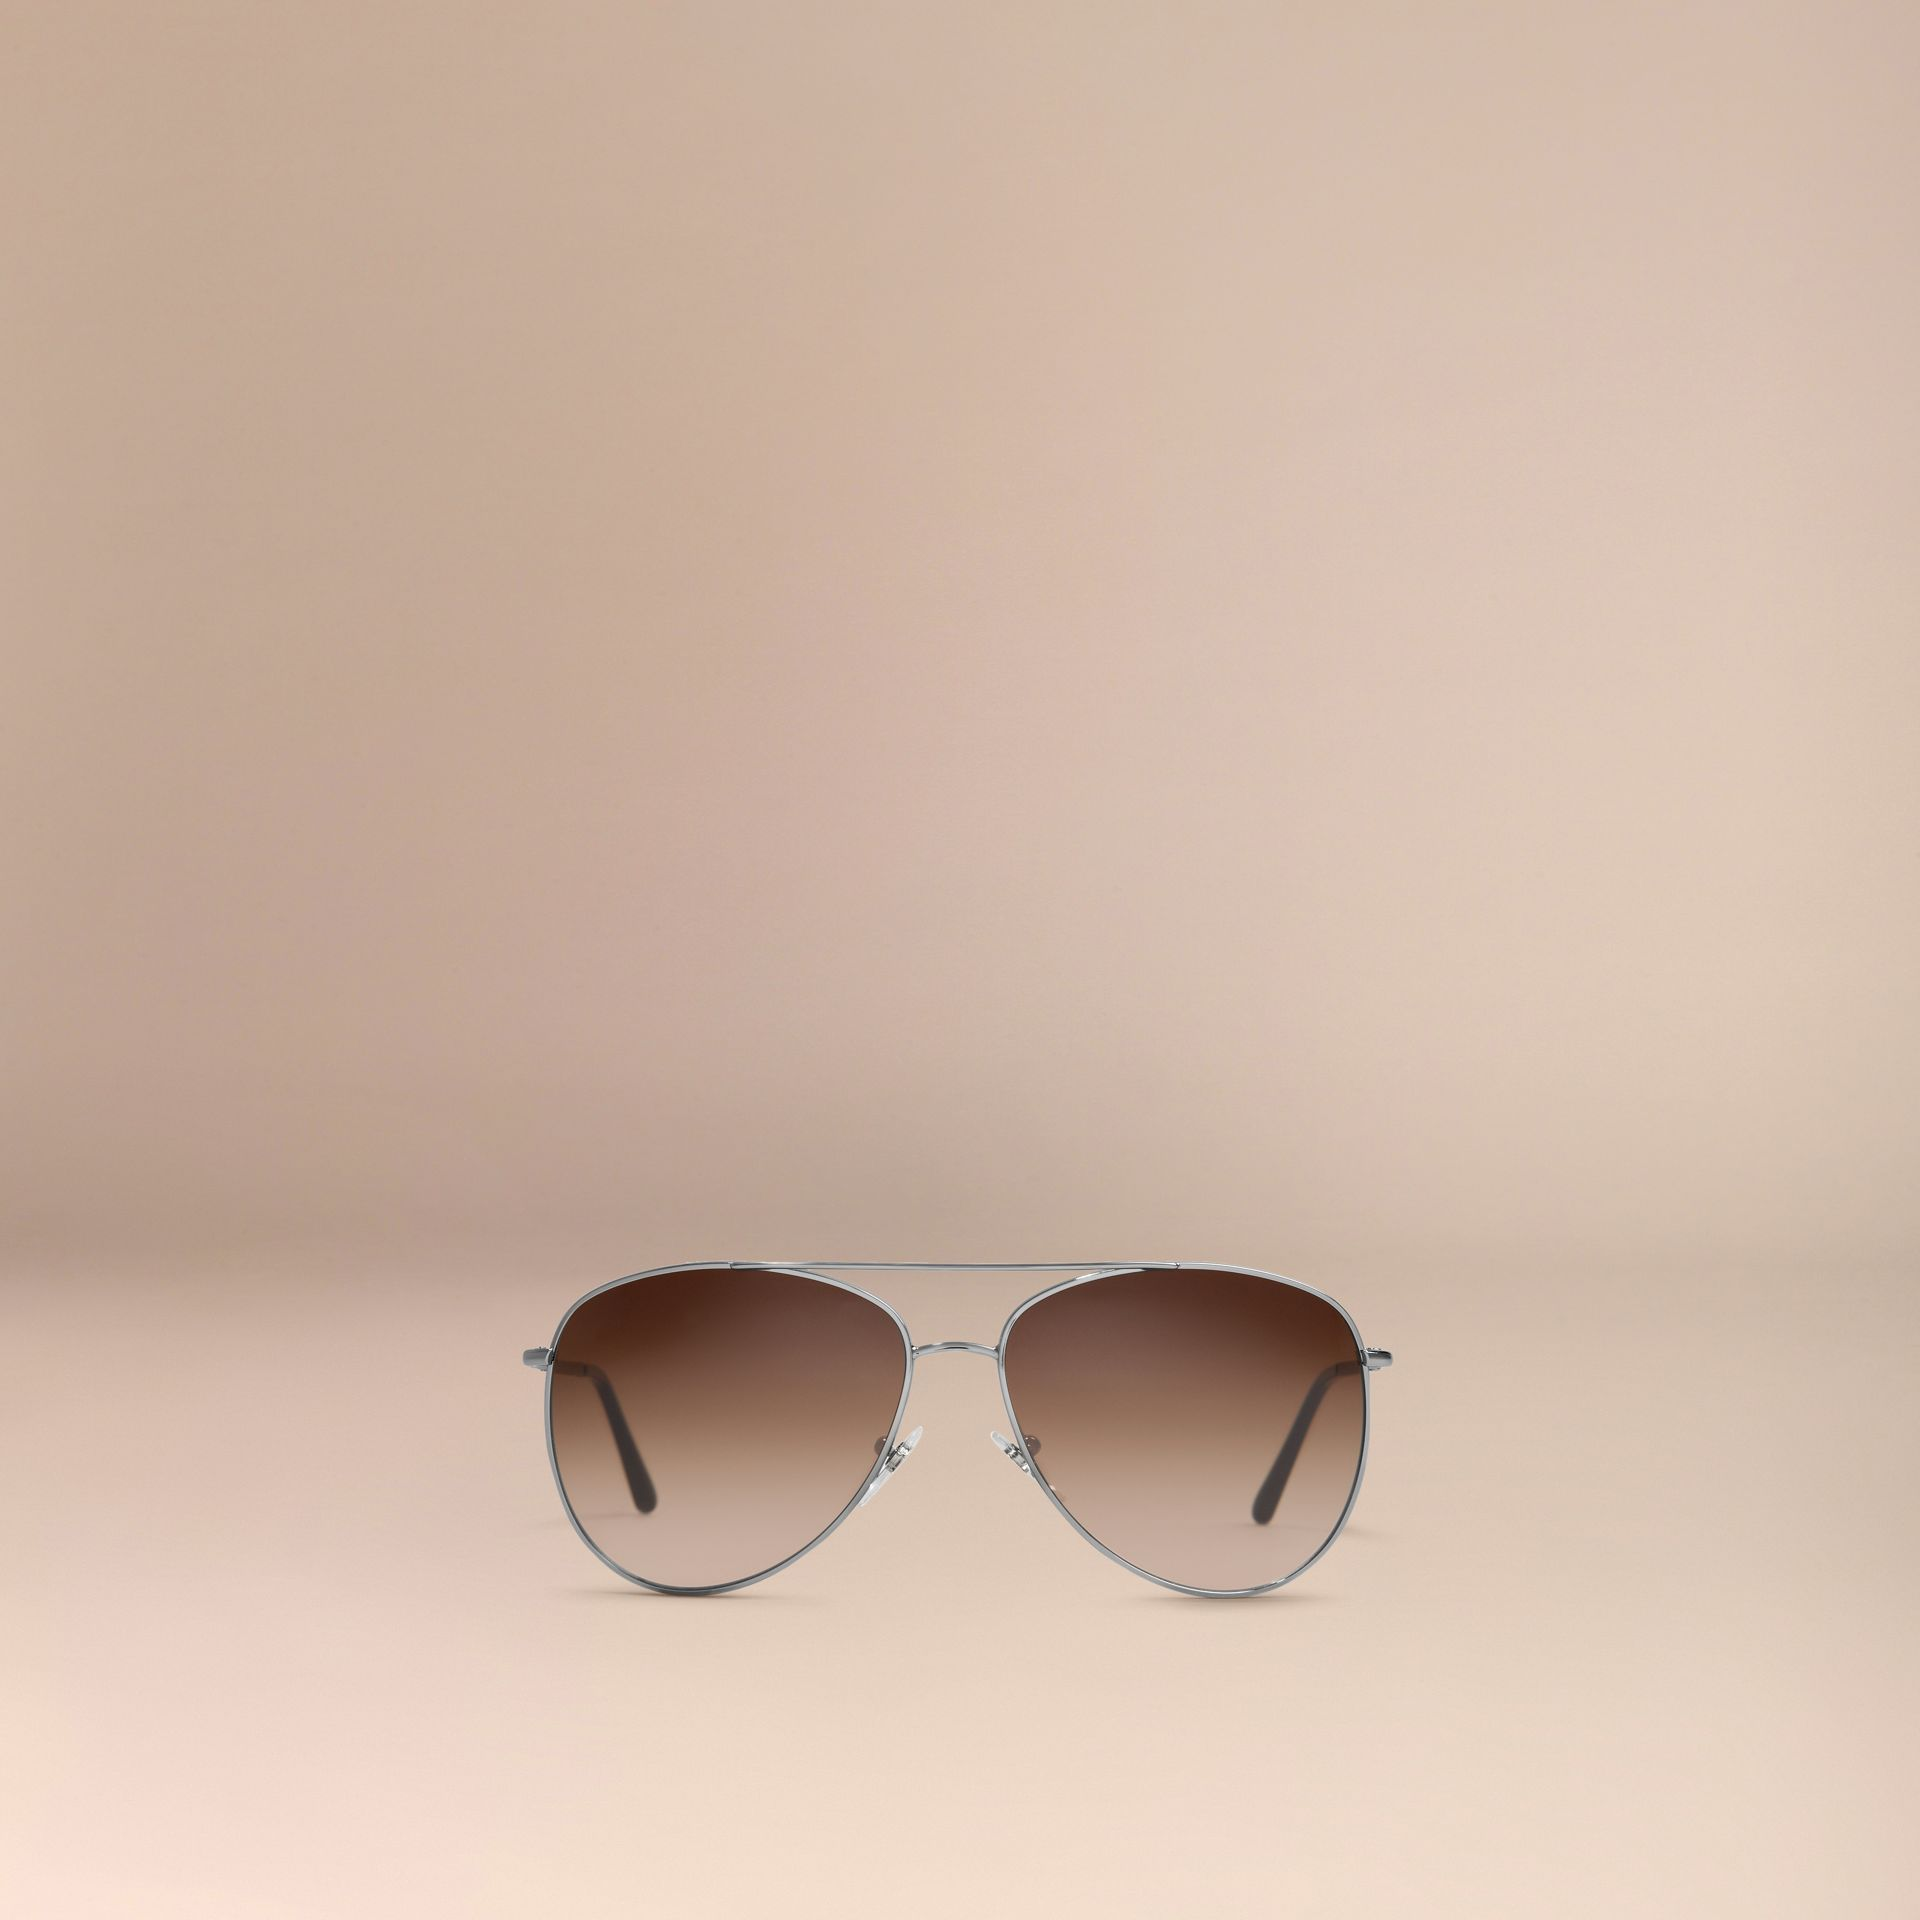 Nickel Check Arm Aviator Sunglasses Nickel - gallery image 4